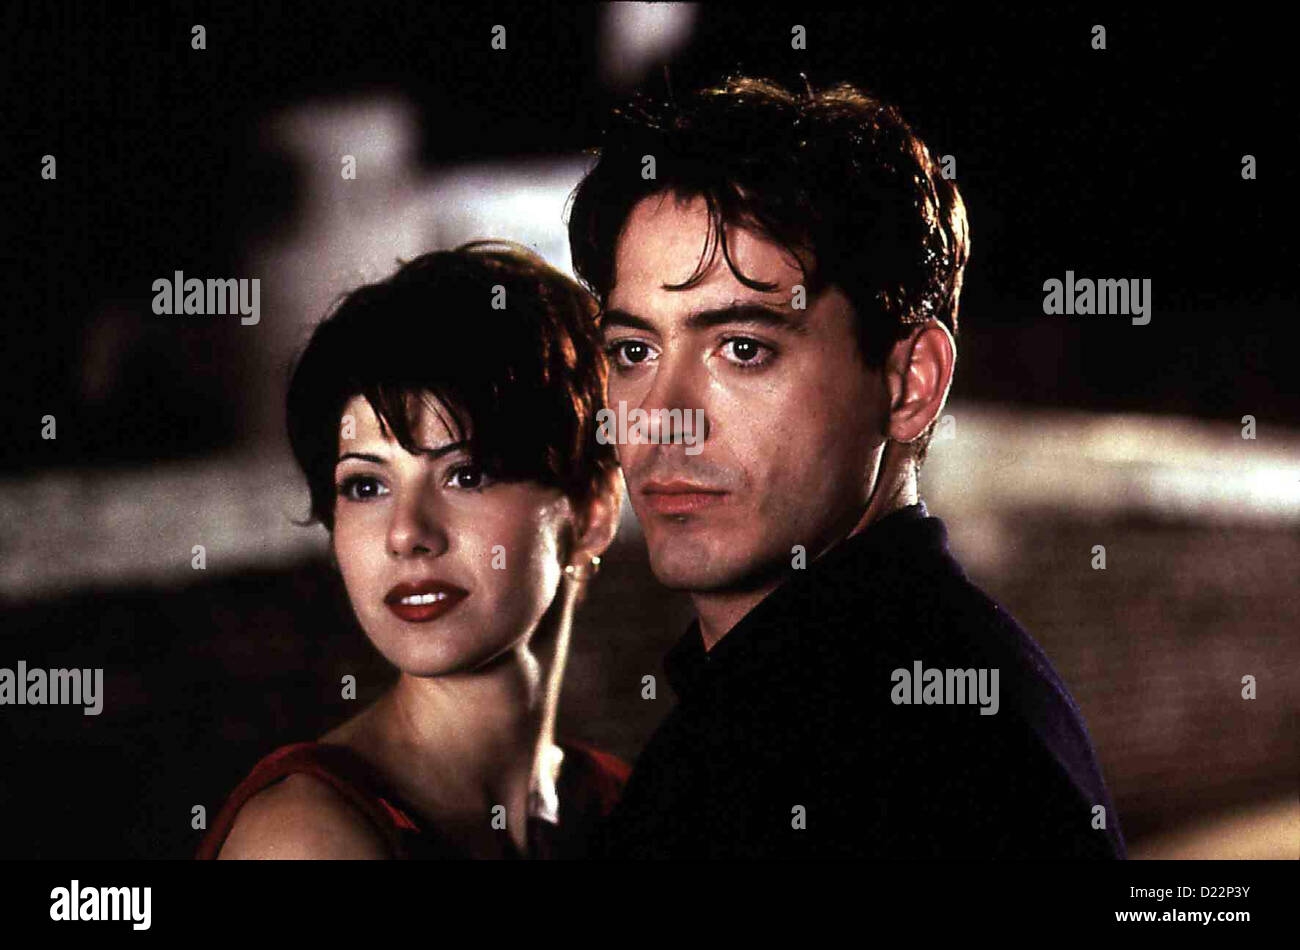 Nur Fuer Dich - Only You  Only You  Marisa Tomei, Robert Downey Jr. Doch dann erfaehrt Faith (Marisa Tomei), dass - Stock Image